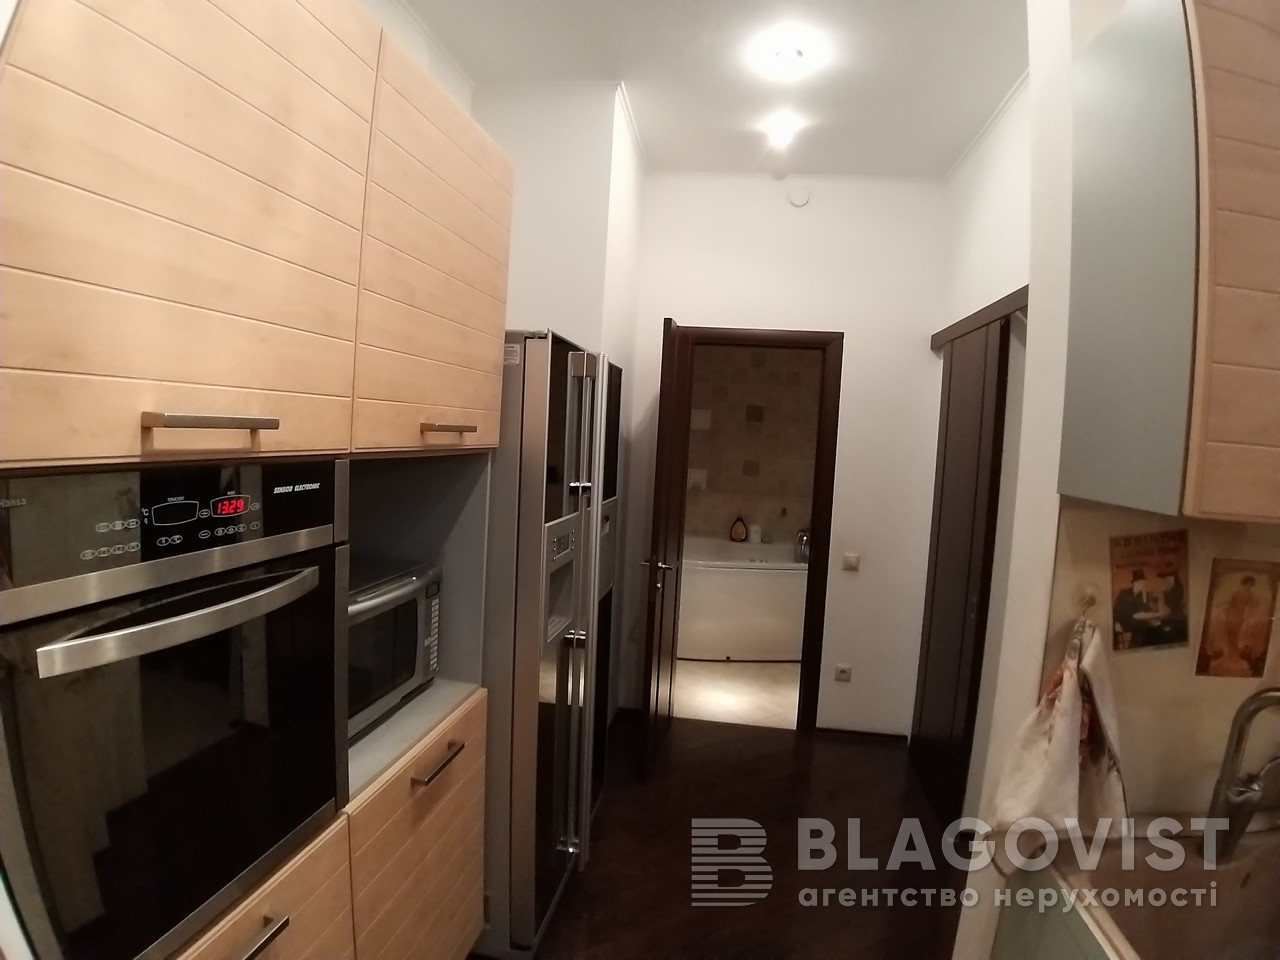 Квартира H-41767, Коновальця Євгена (Щорса), 32г, Київ - Фото 10